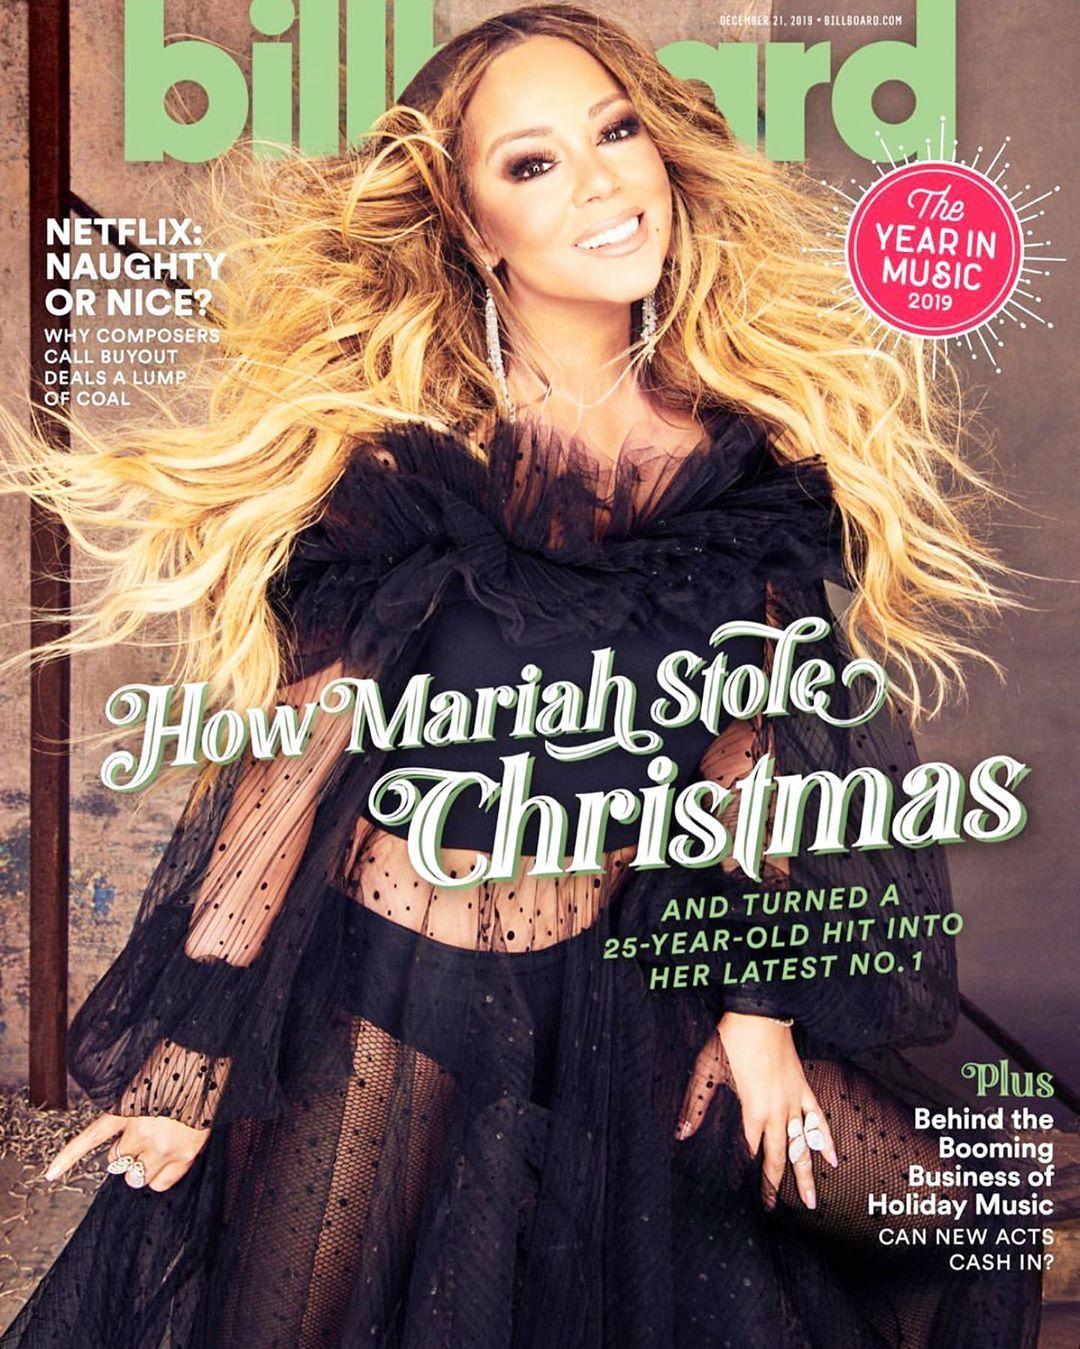 Mariah Carey Billboard Magazine Christmas Alliwantforchristmas Music Blackgirlmagic Blackgirlsrock In 2020 Mariah Carey Mariah Billboard Magazine